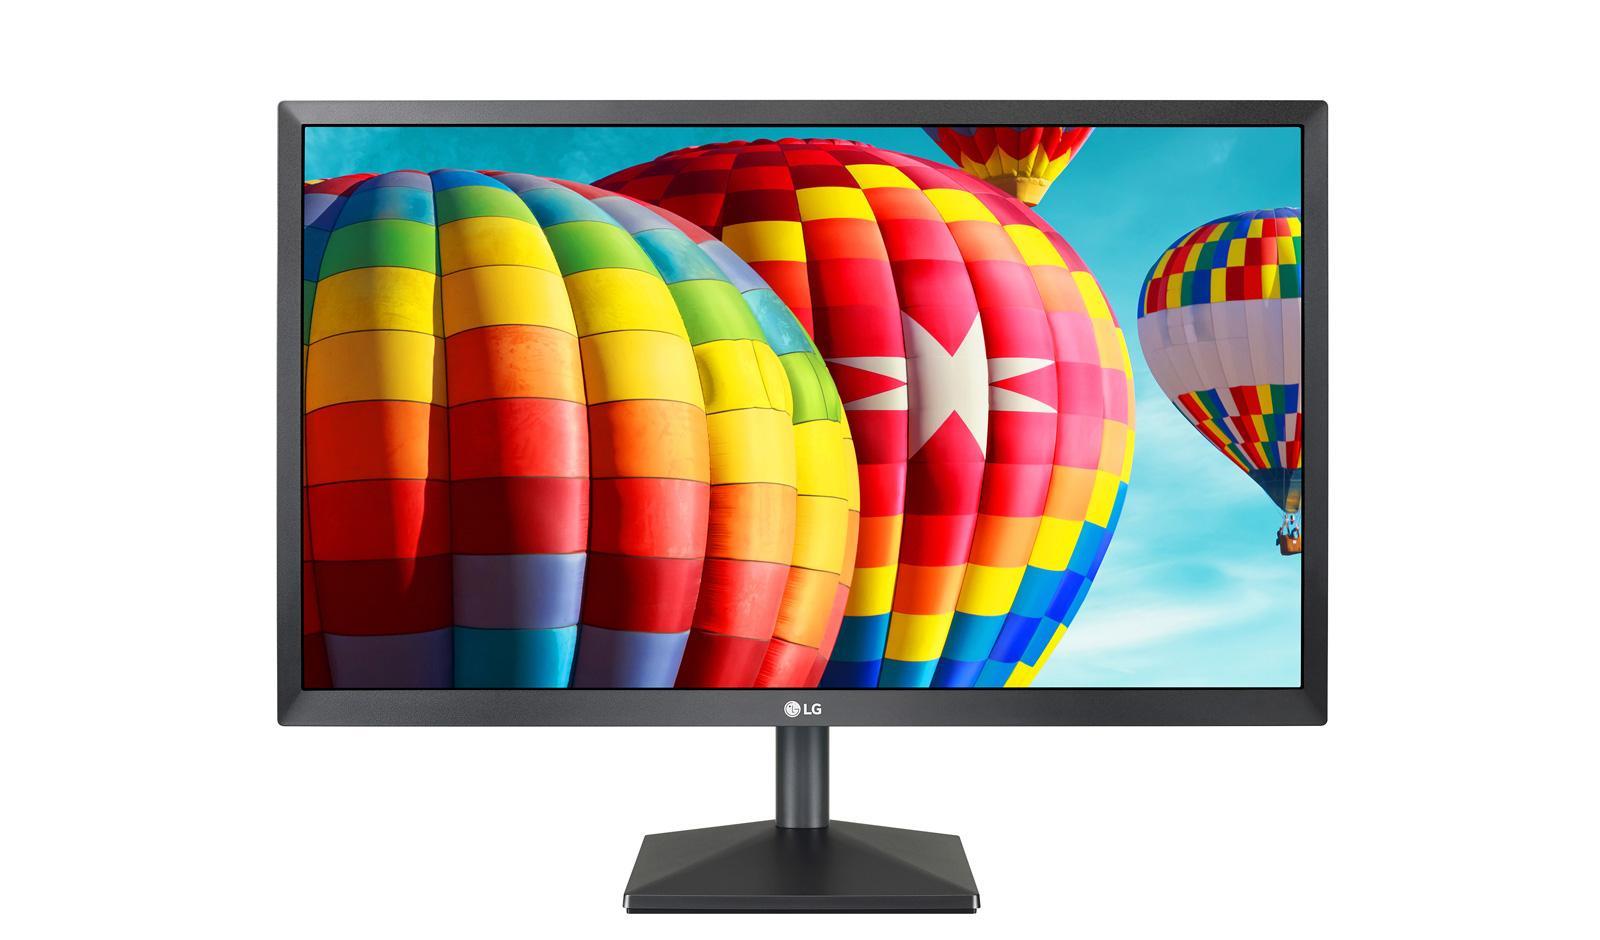 LG Consumer Monitors 22MK430H-B 1